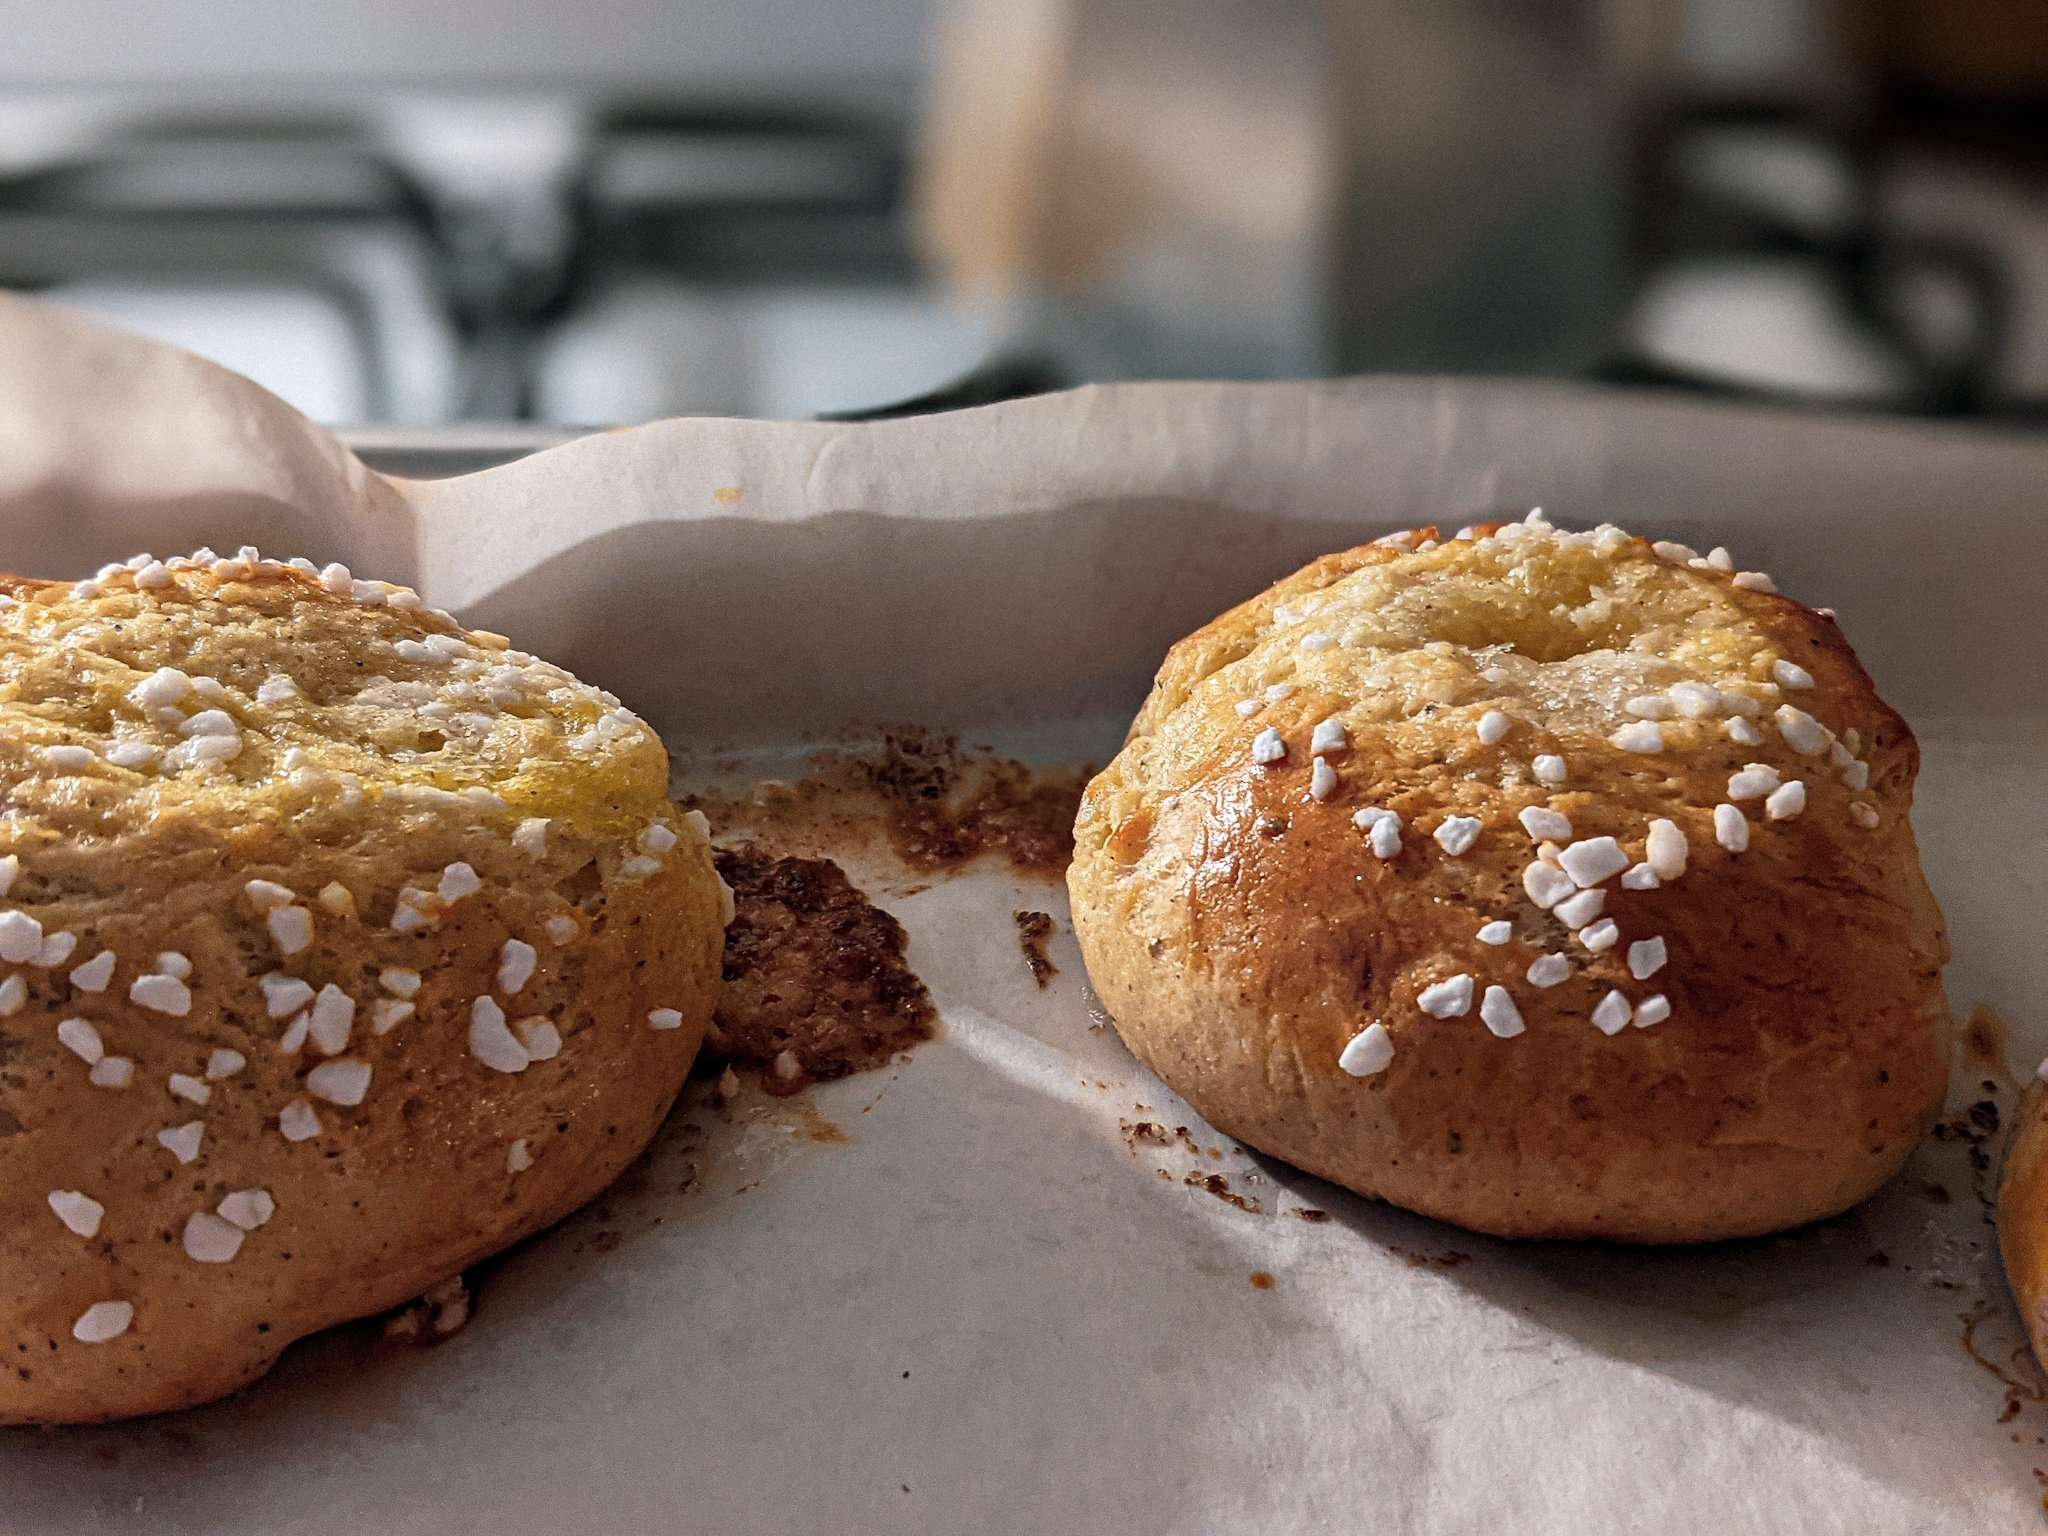 Voisilmäpulla (Finnish Butter-Eye Buns) and Memories of Helsinki